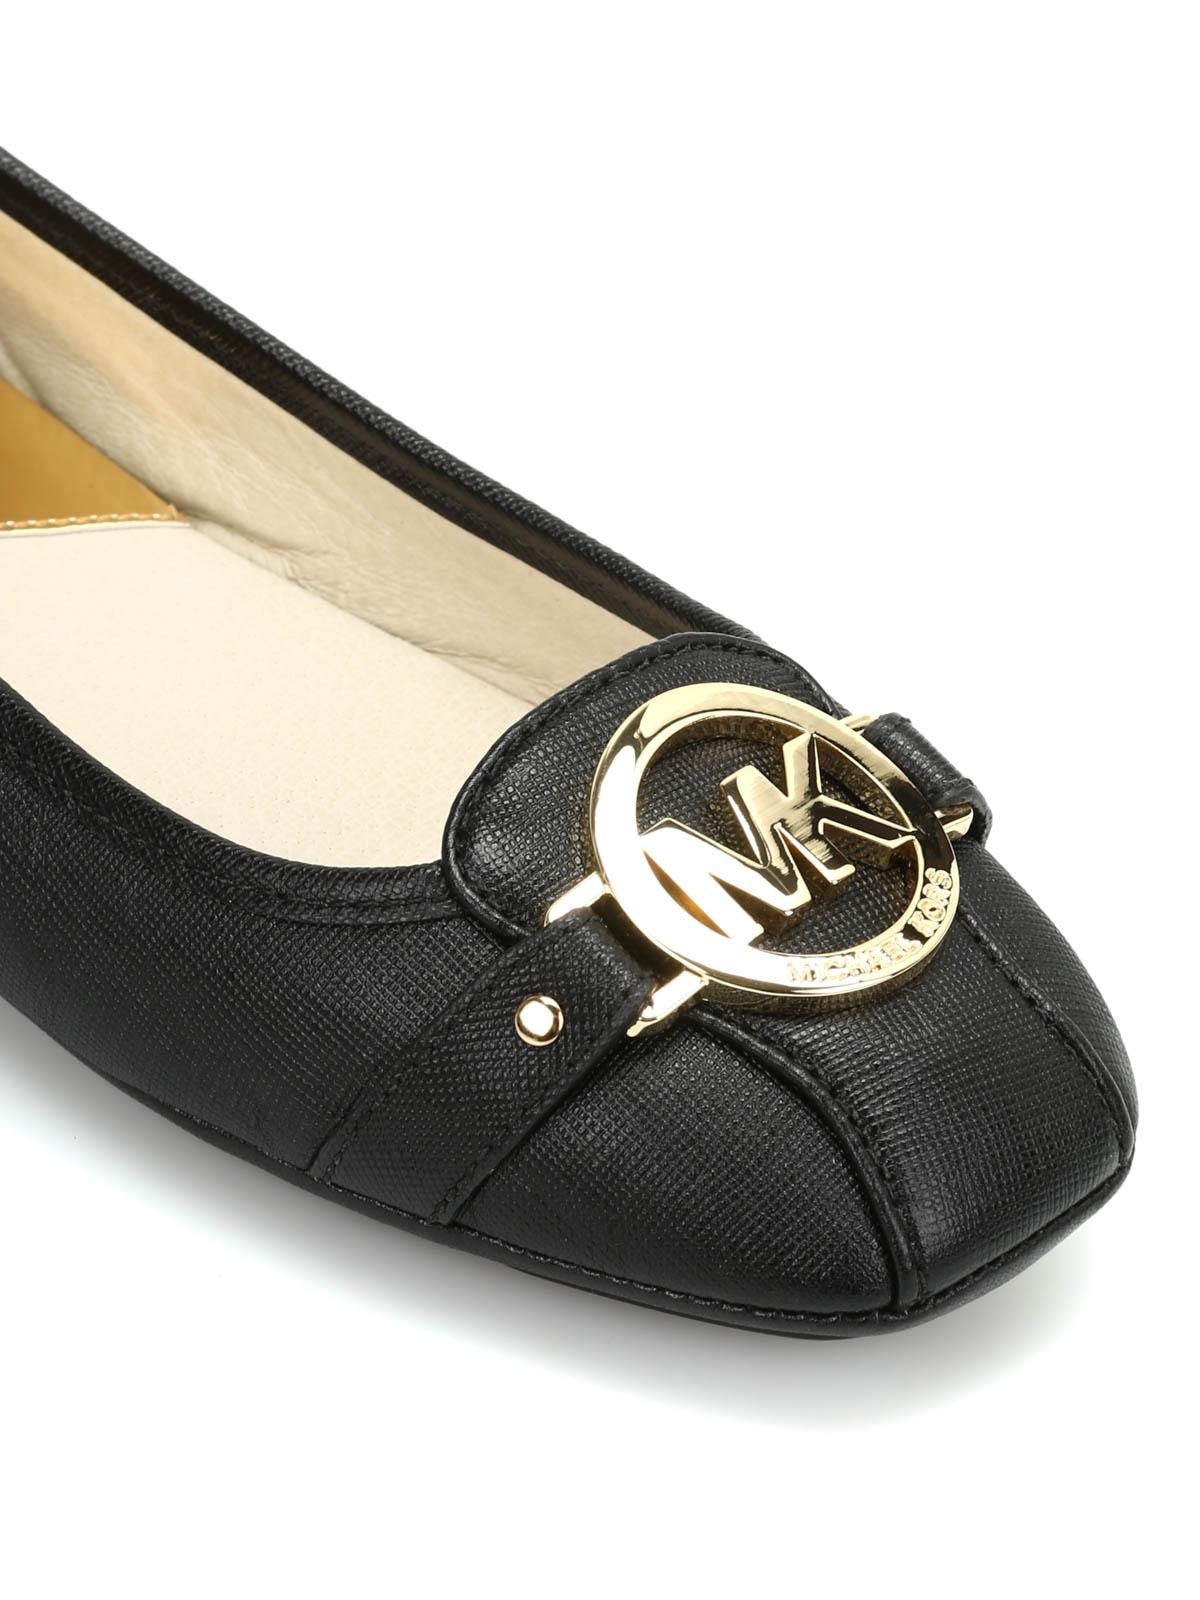 4994685e4c5 Michael Kors - Fulton flats - flat shoes - 40R5FUFR2L BLACK